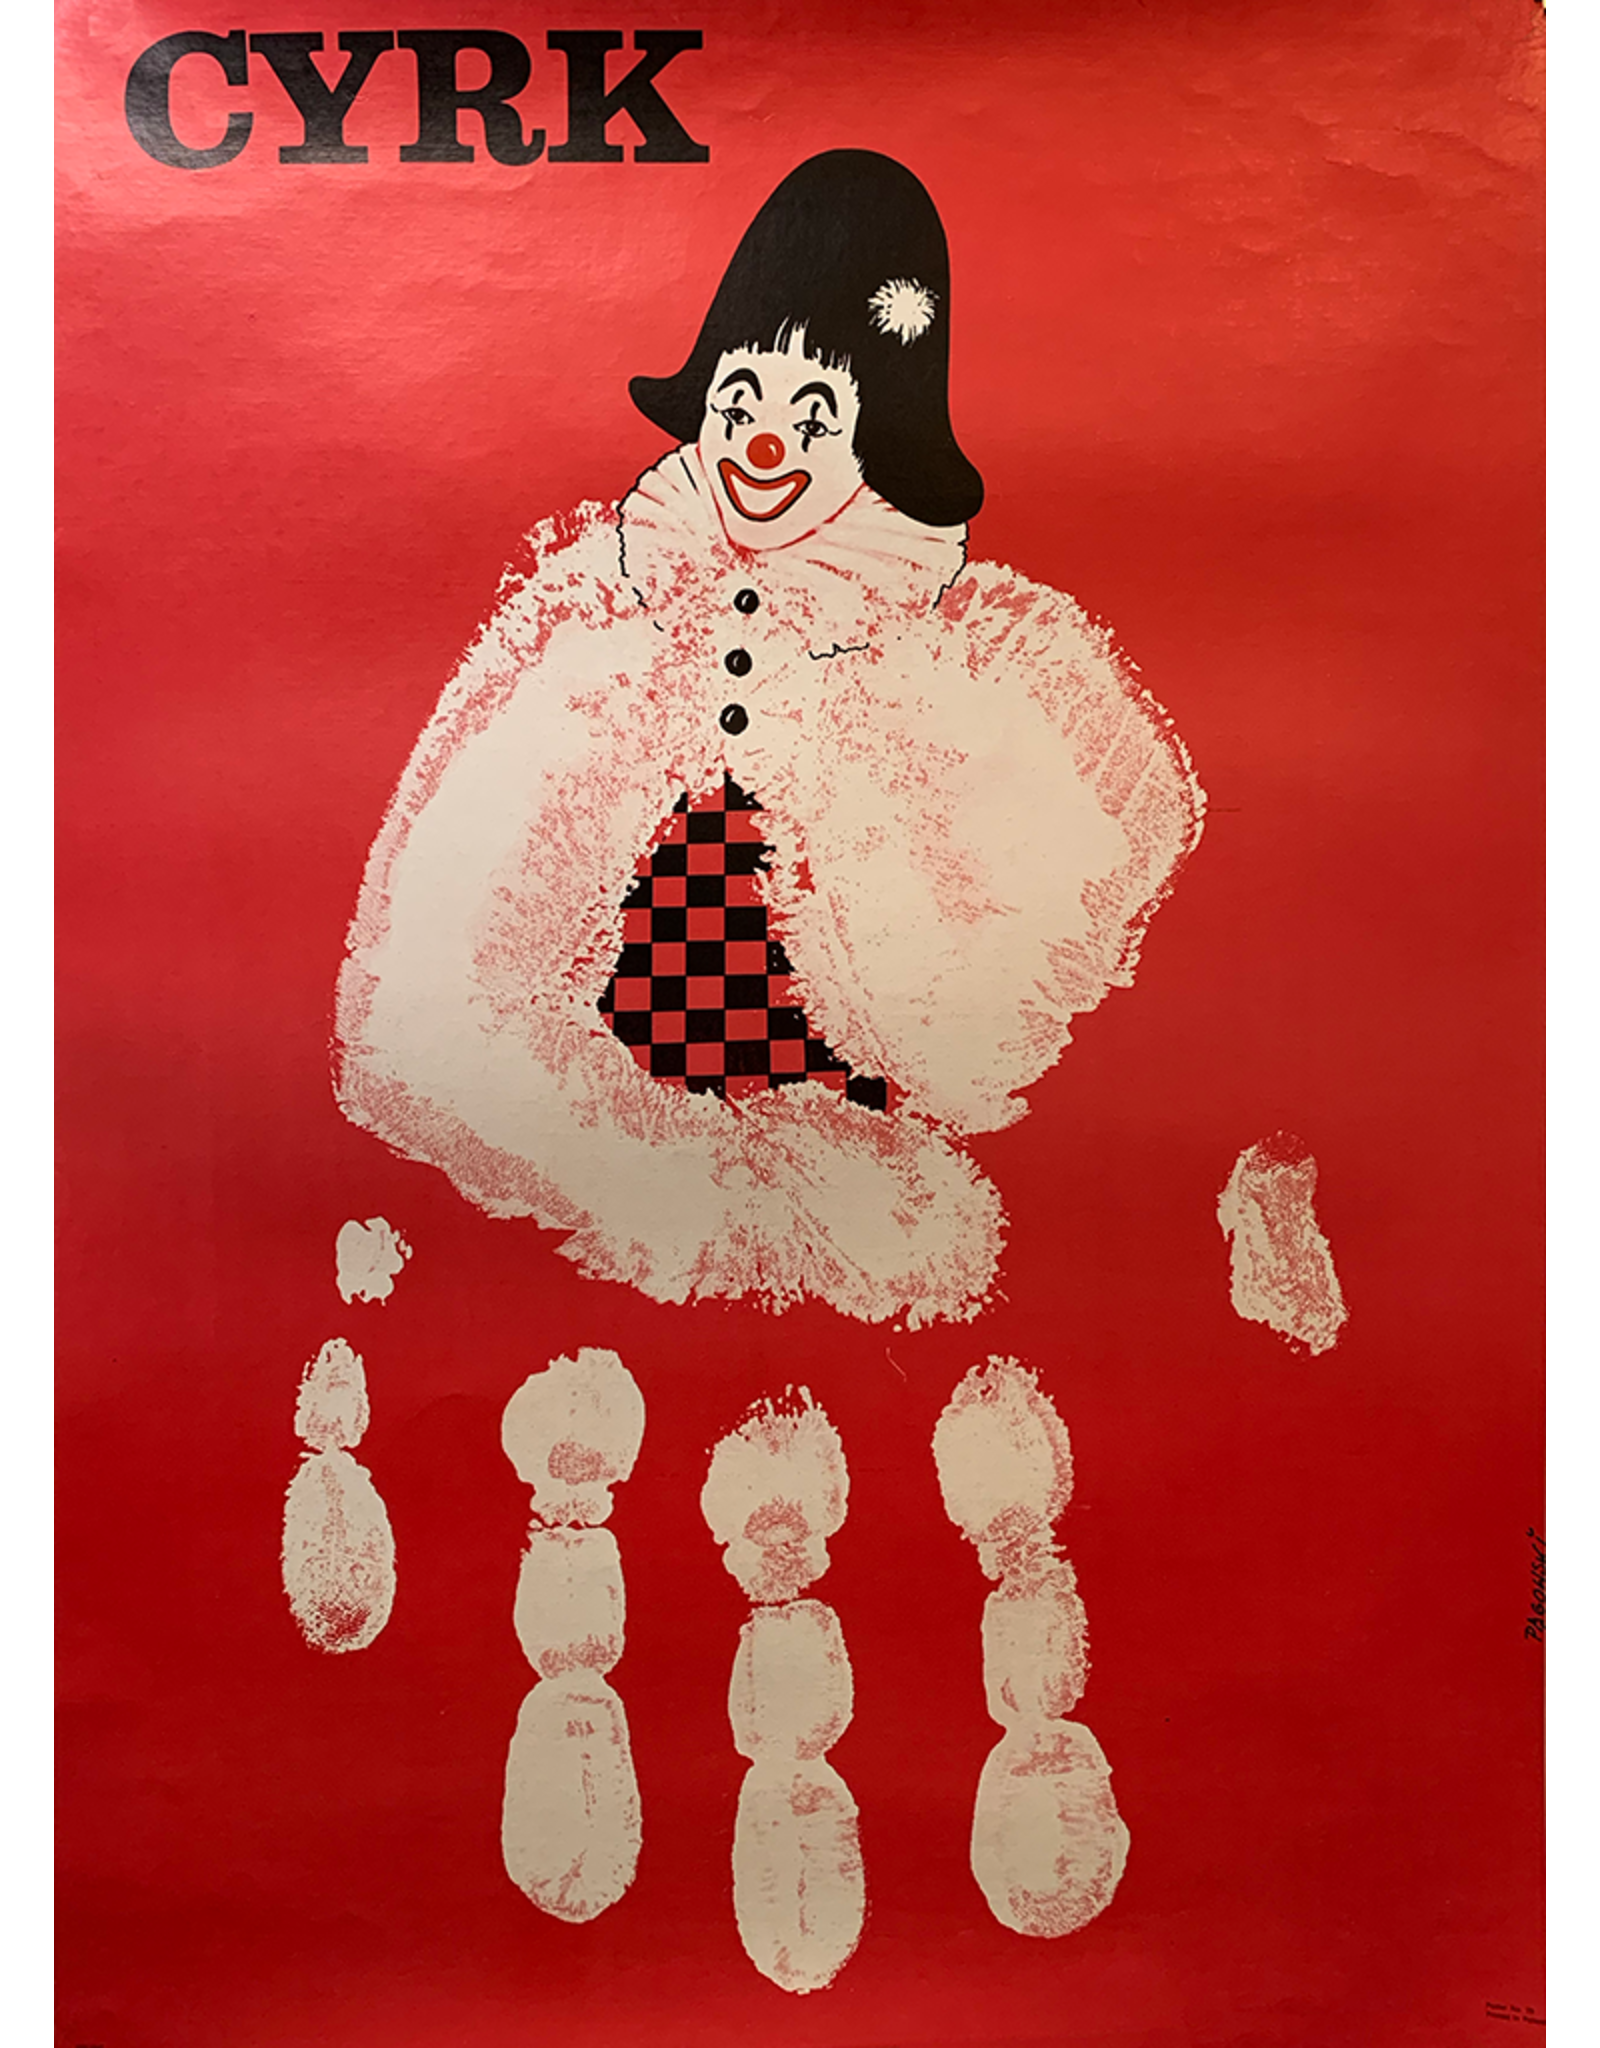 SPV CYRK, Hand print clown